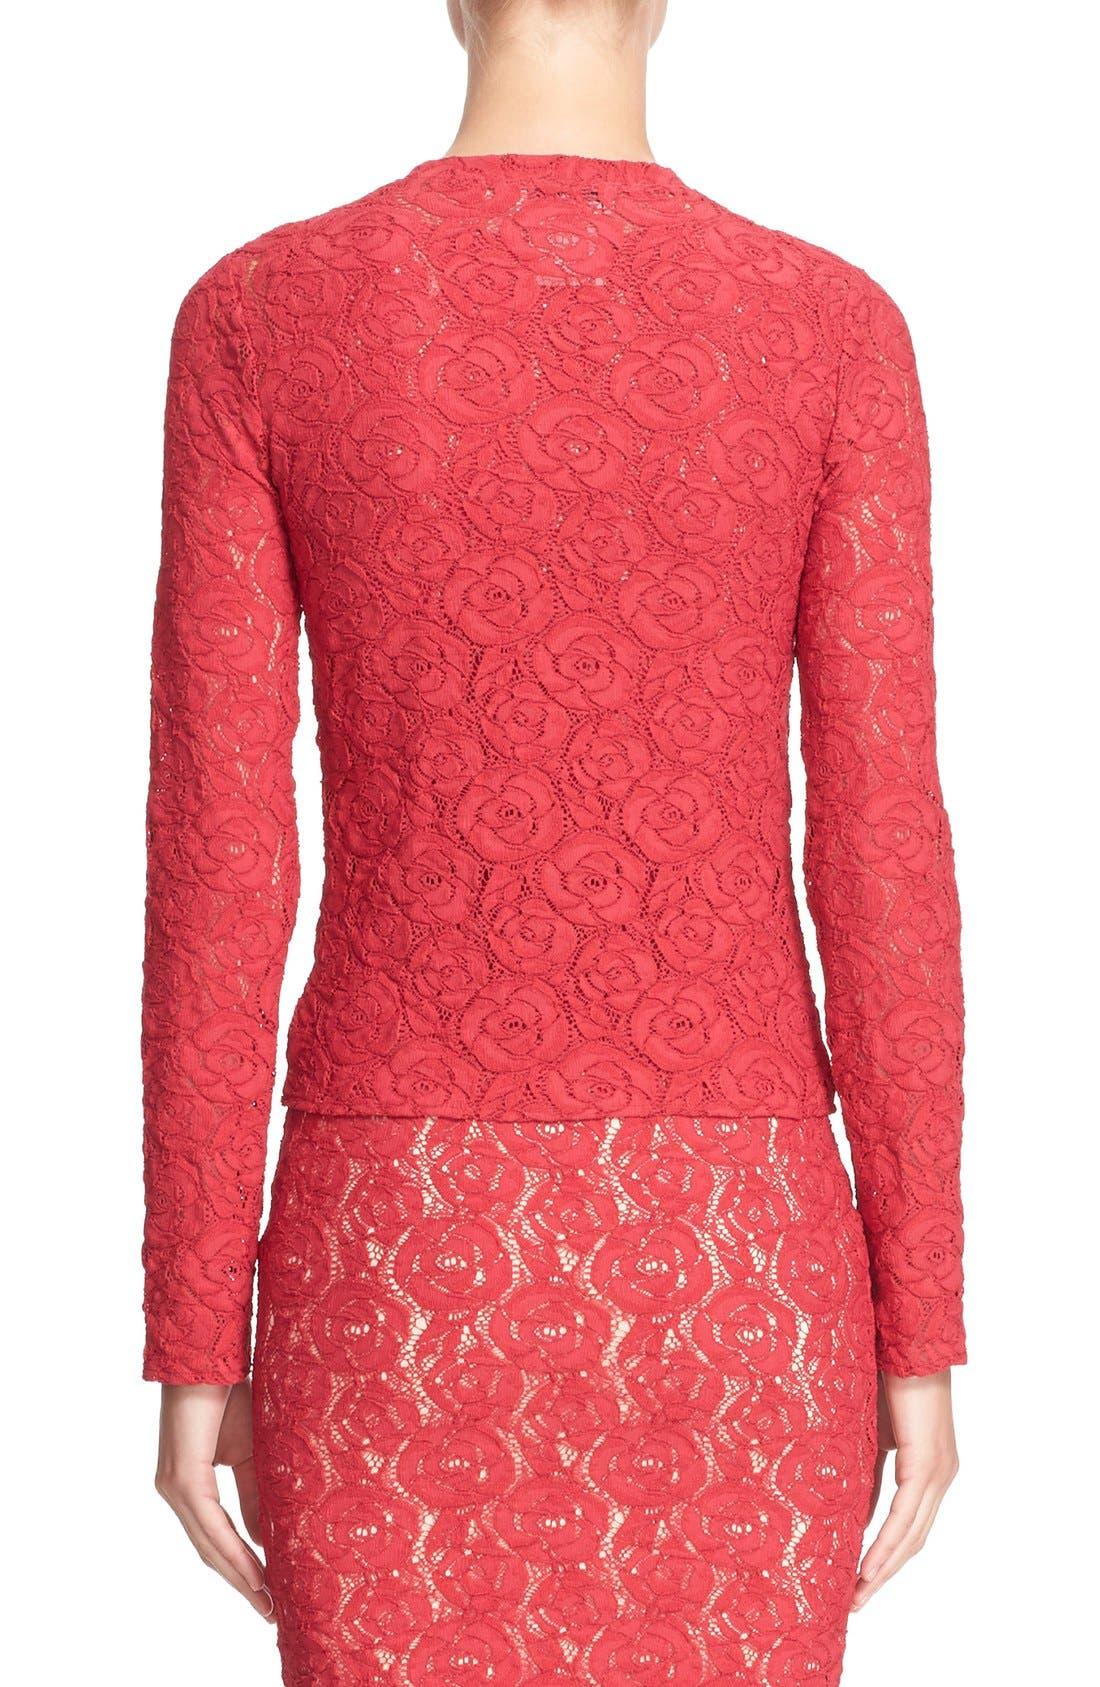 Alternate Image 2  - Fuzzi Floral Lace Cardigan